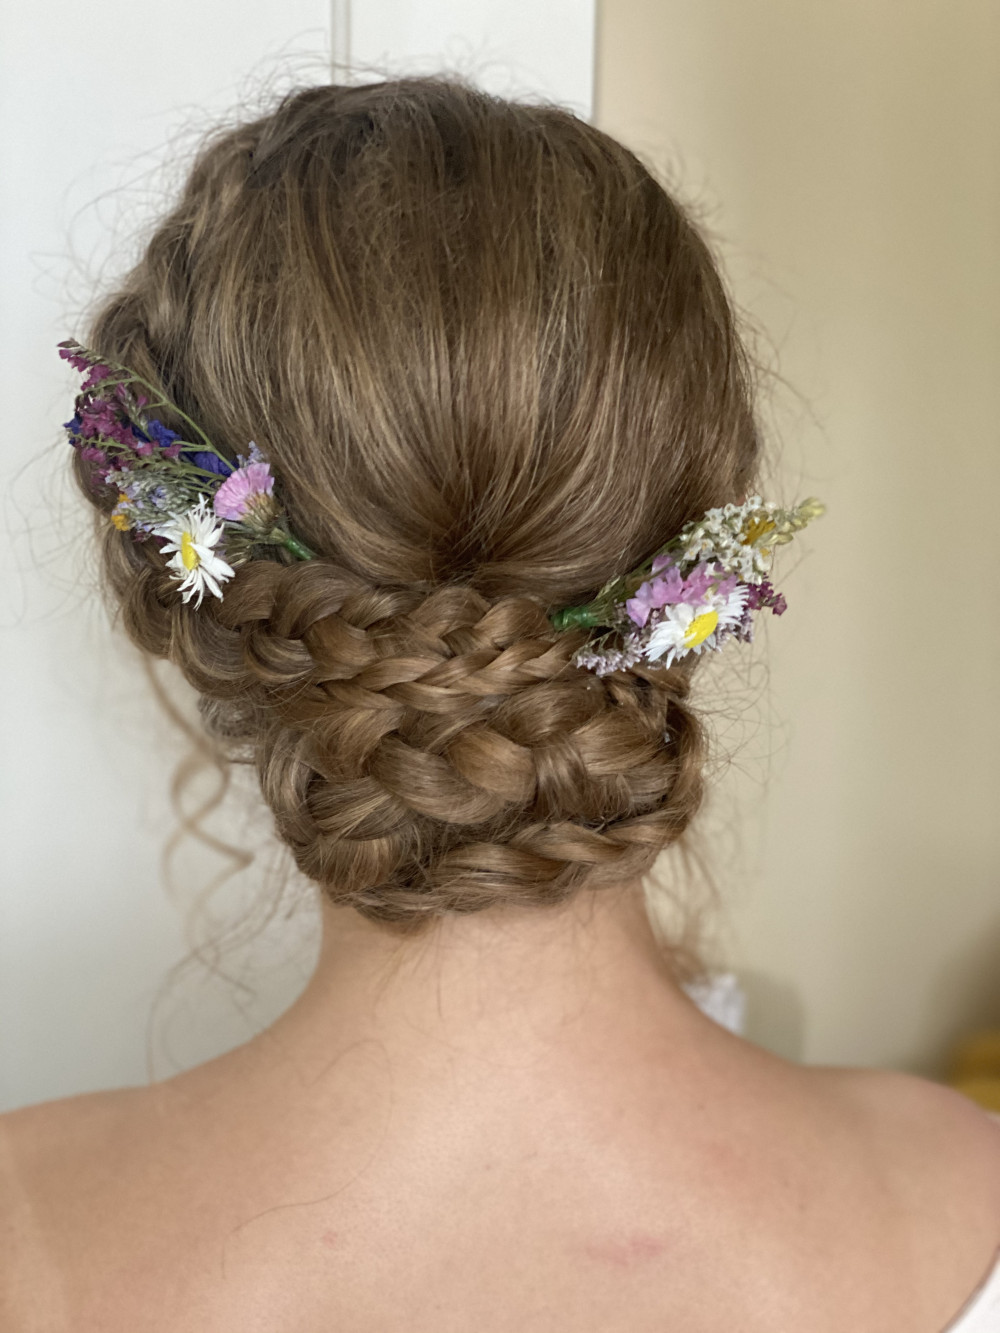 Braided boho hair up - Make Me Bridal Artist: RLM wedding makeup. Photography by: Rebecca Louise Middleton. #bohohair